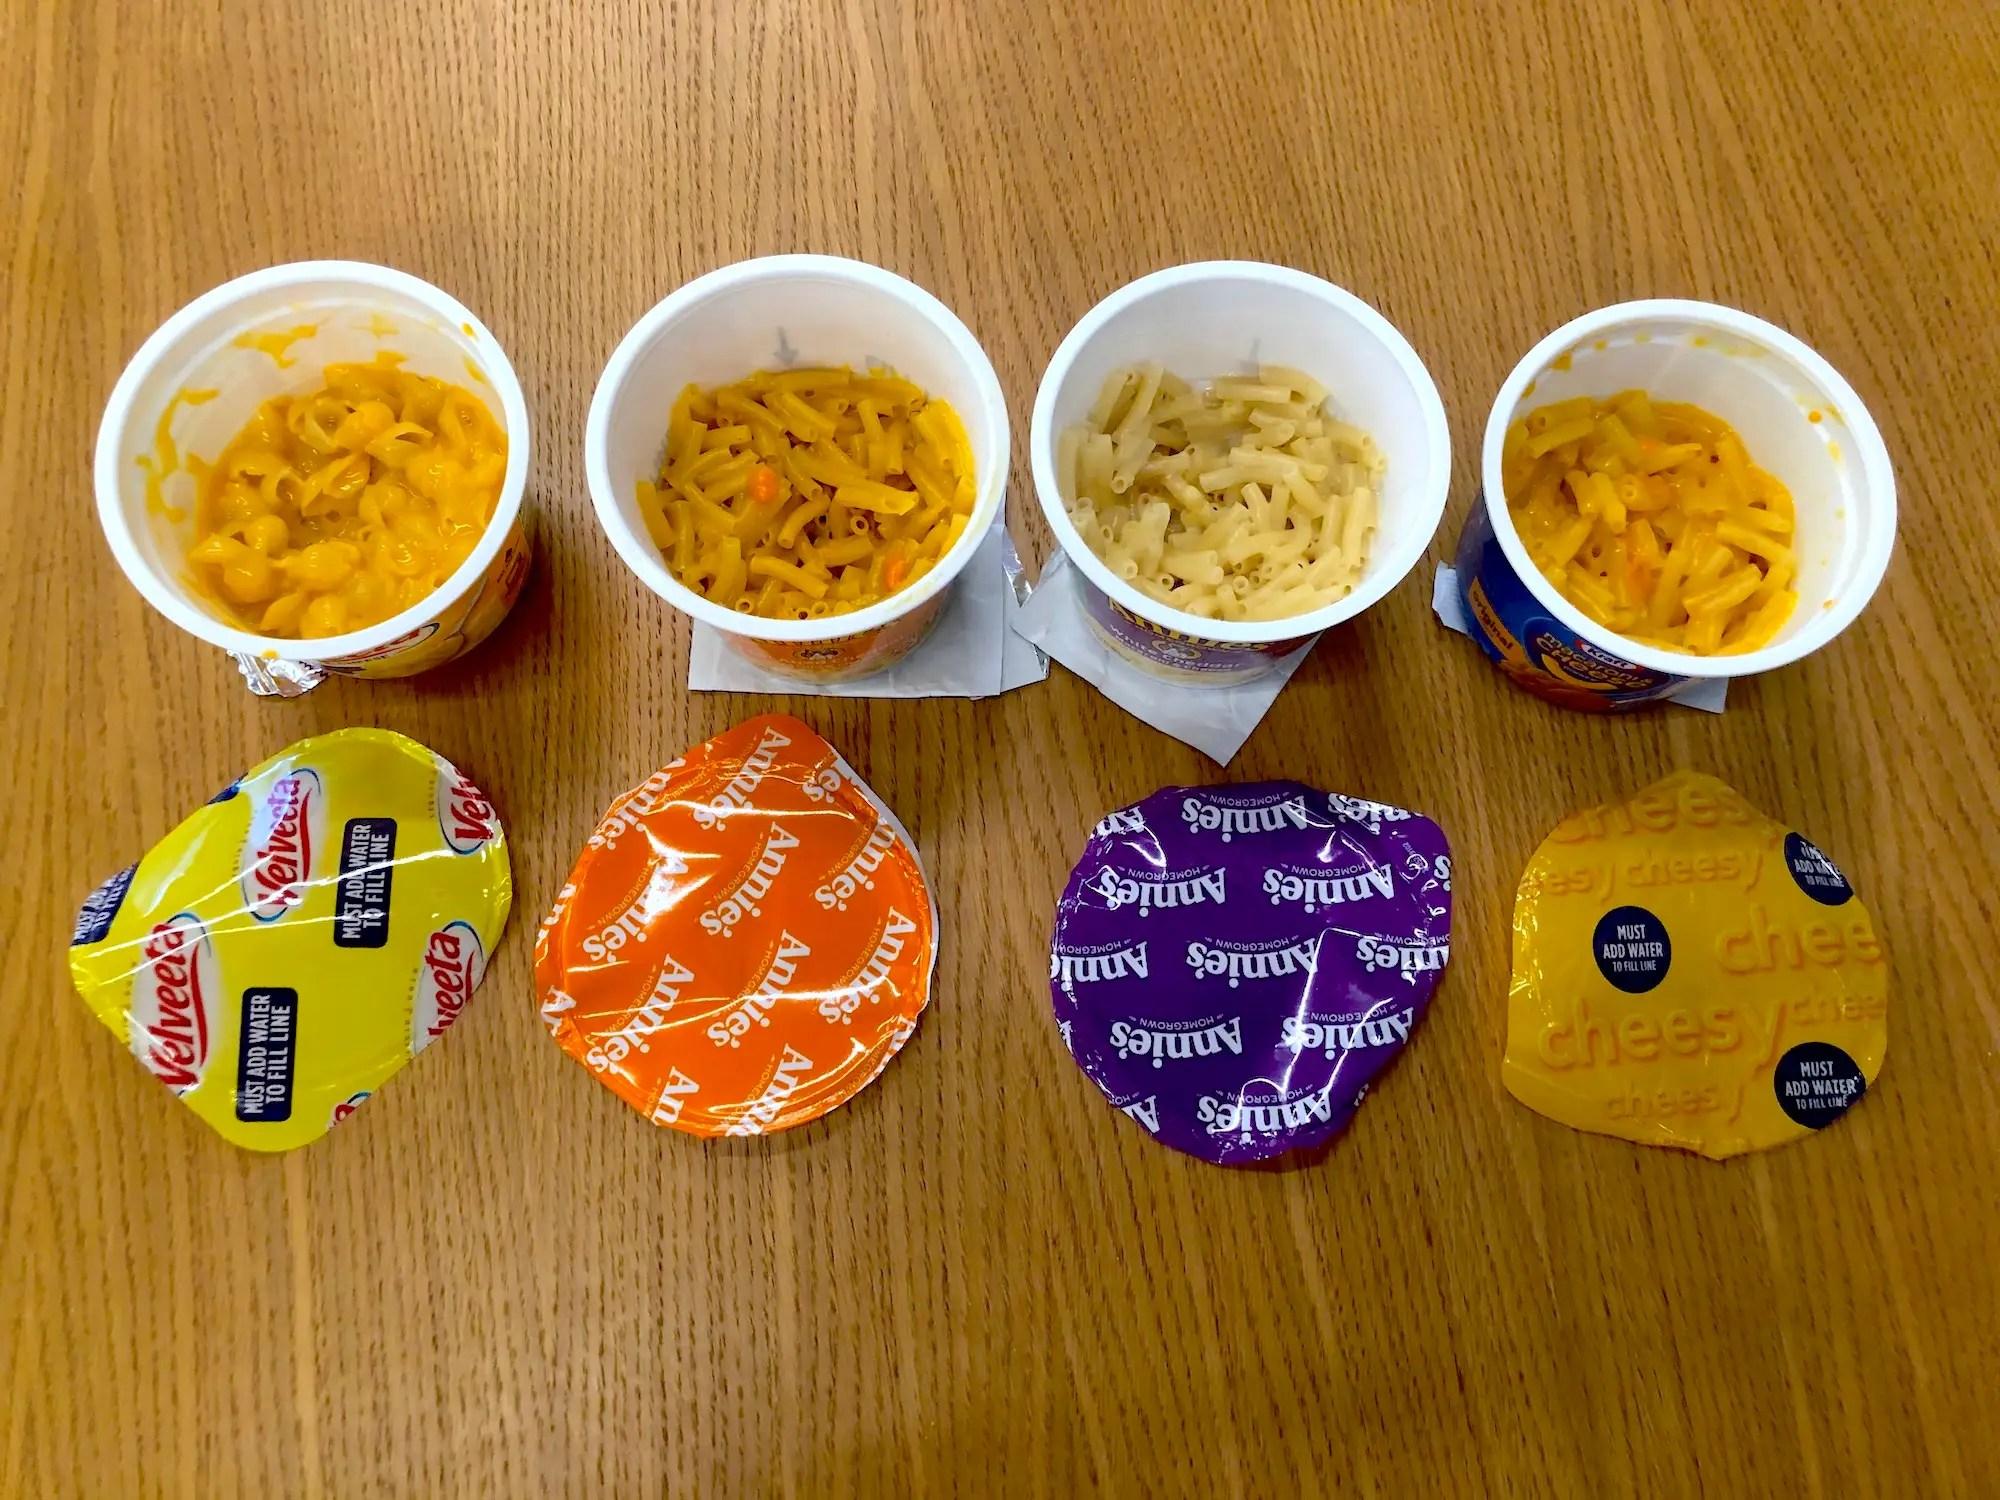 microwavable macaroni and cheese